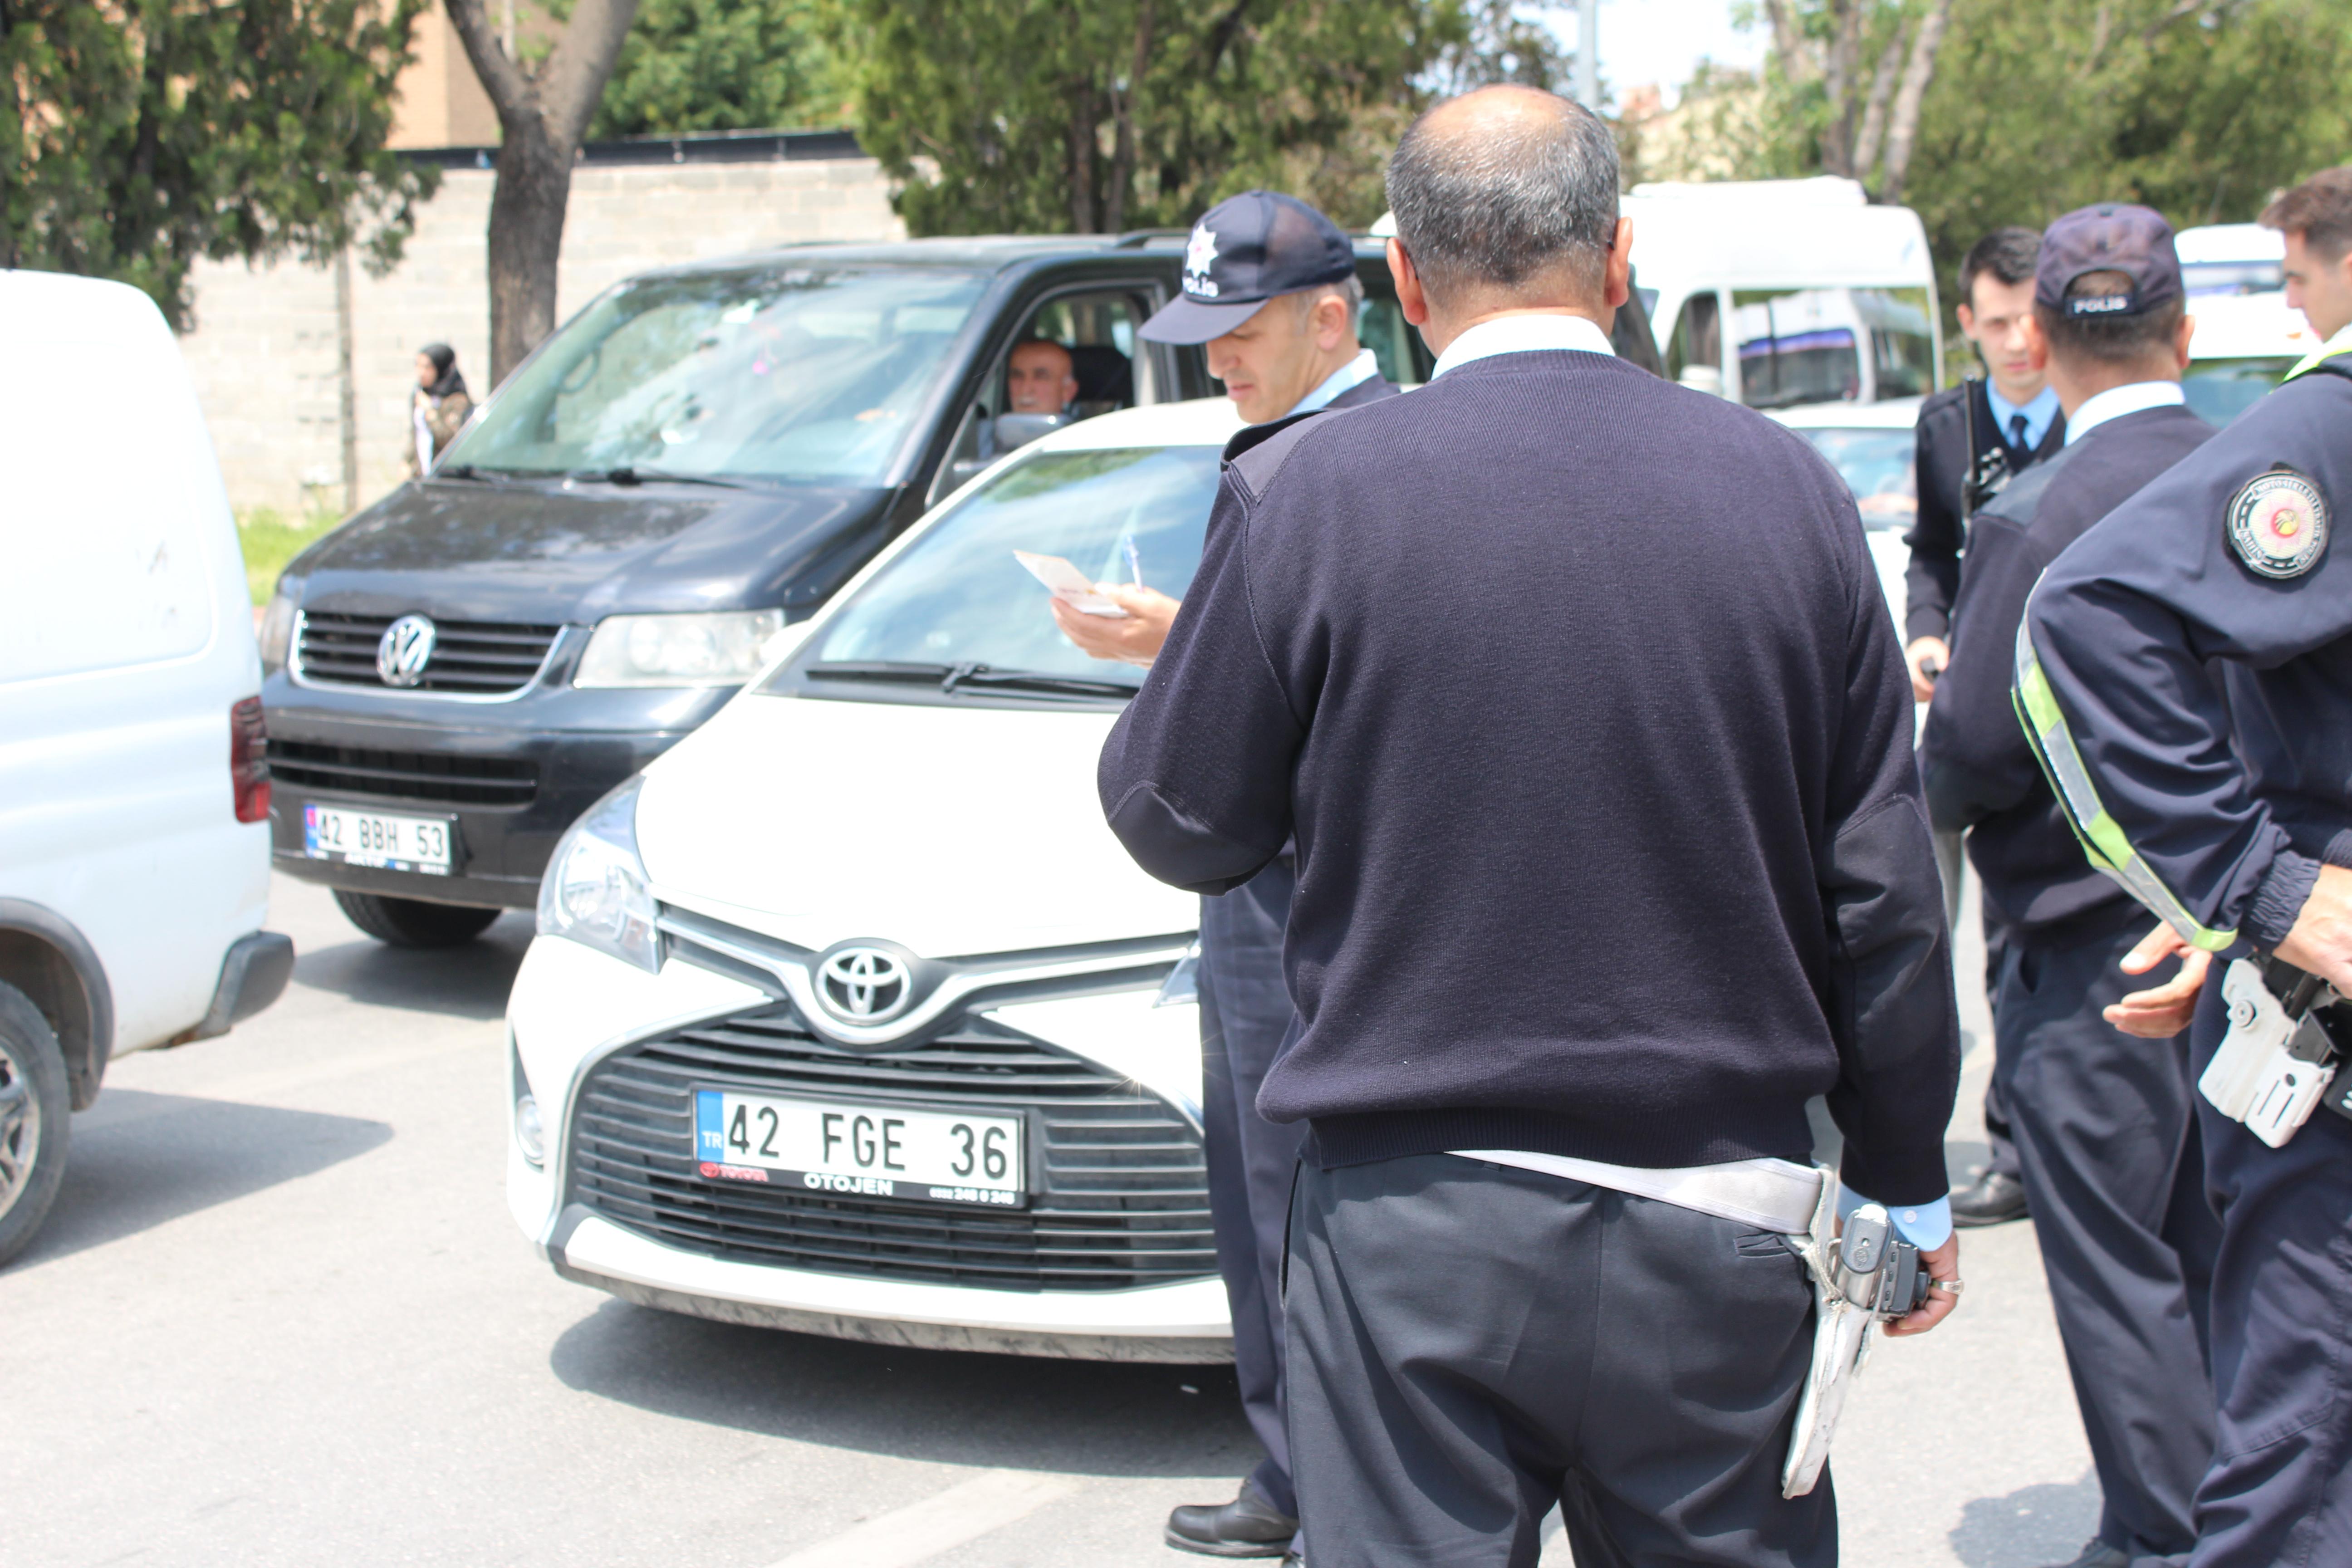 Konya'da silahlı yaralama